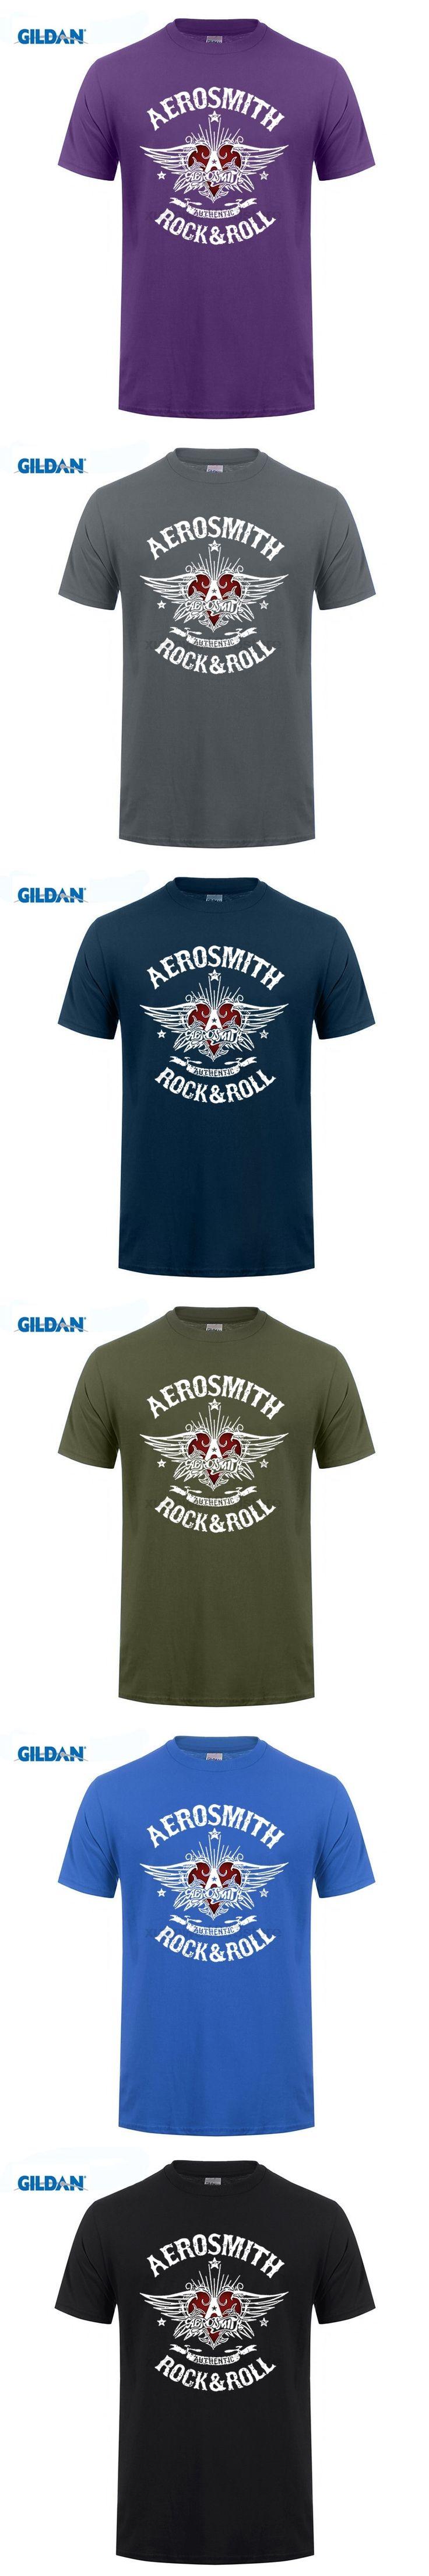 Gildan Aerosmith T Shirt Hard Rock & Roll Band Music Blues Short Sleeves New Fashion T-shirt Men Clothing Black Style Top Tee